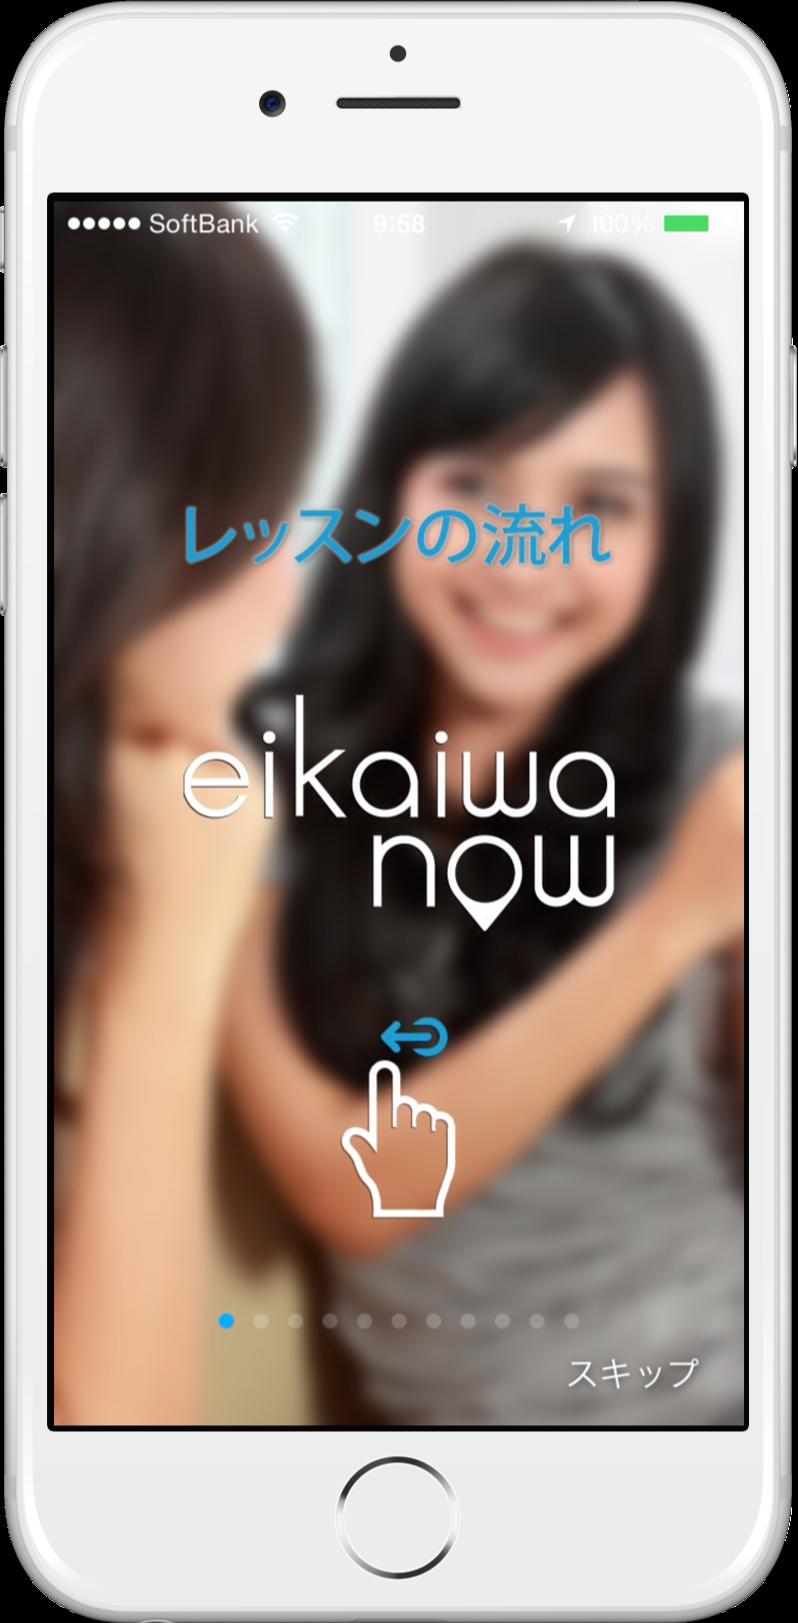 eikaiwaNOW - レッスンの流れ - JPN - 0_iphone6_silver_portrait.png